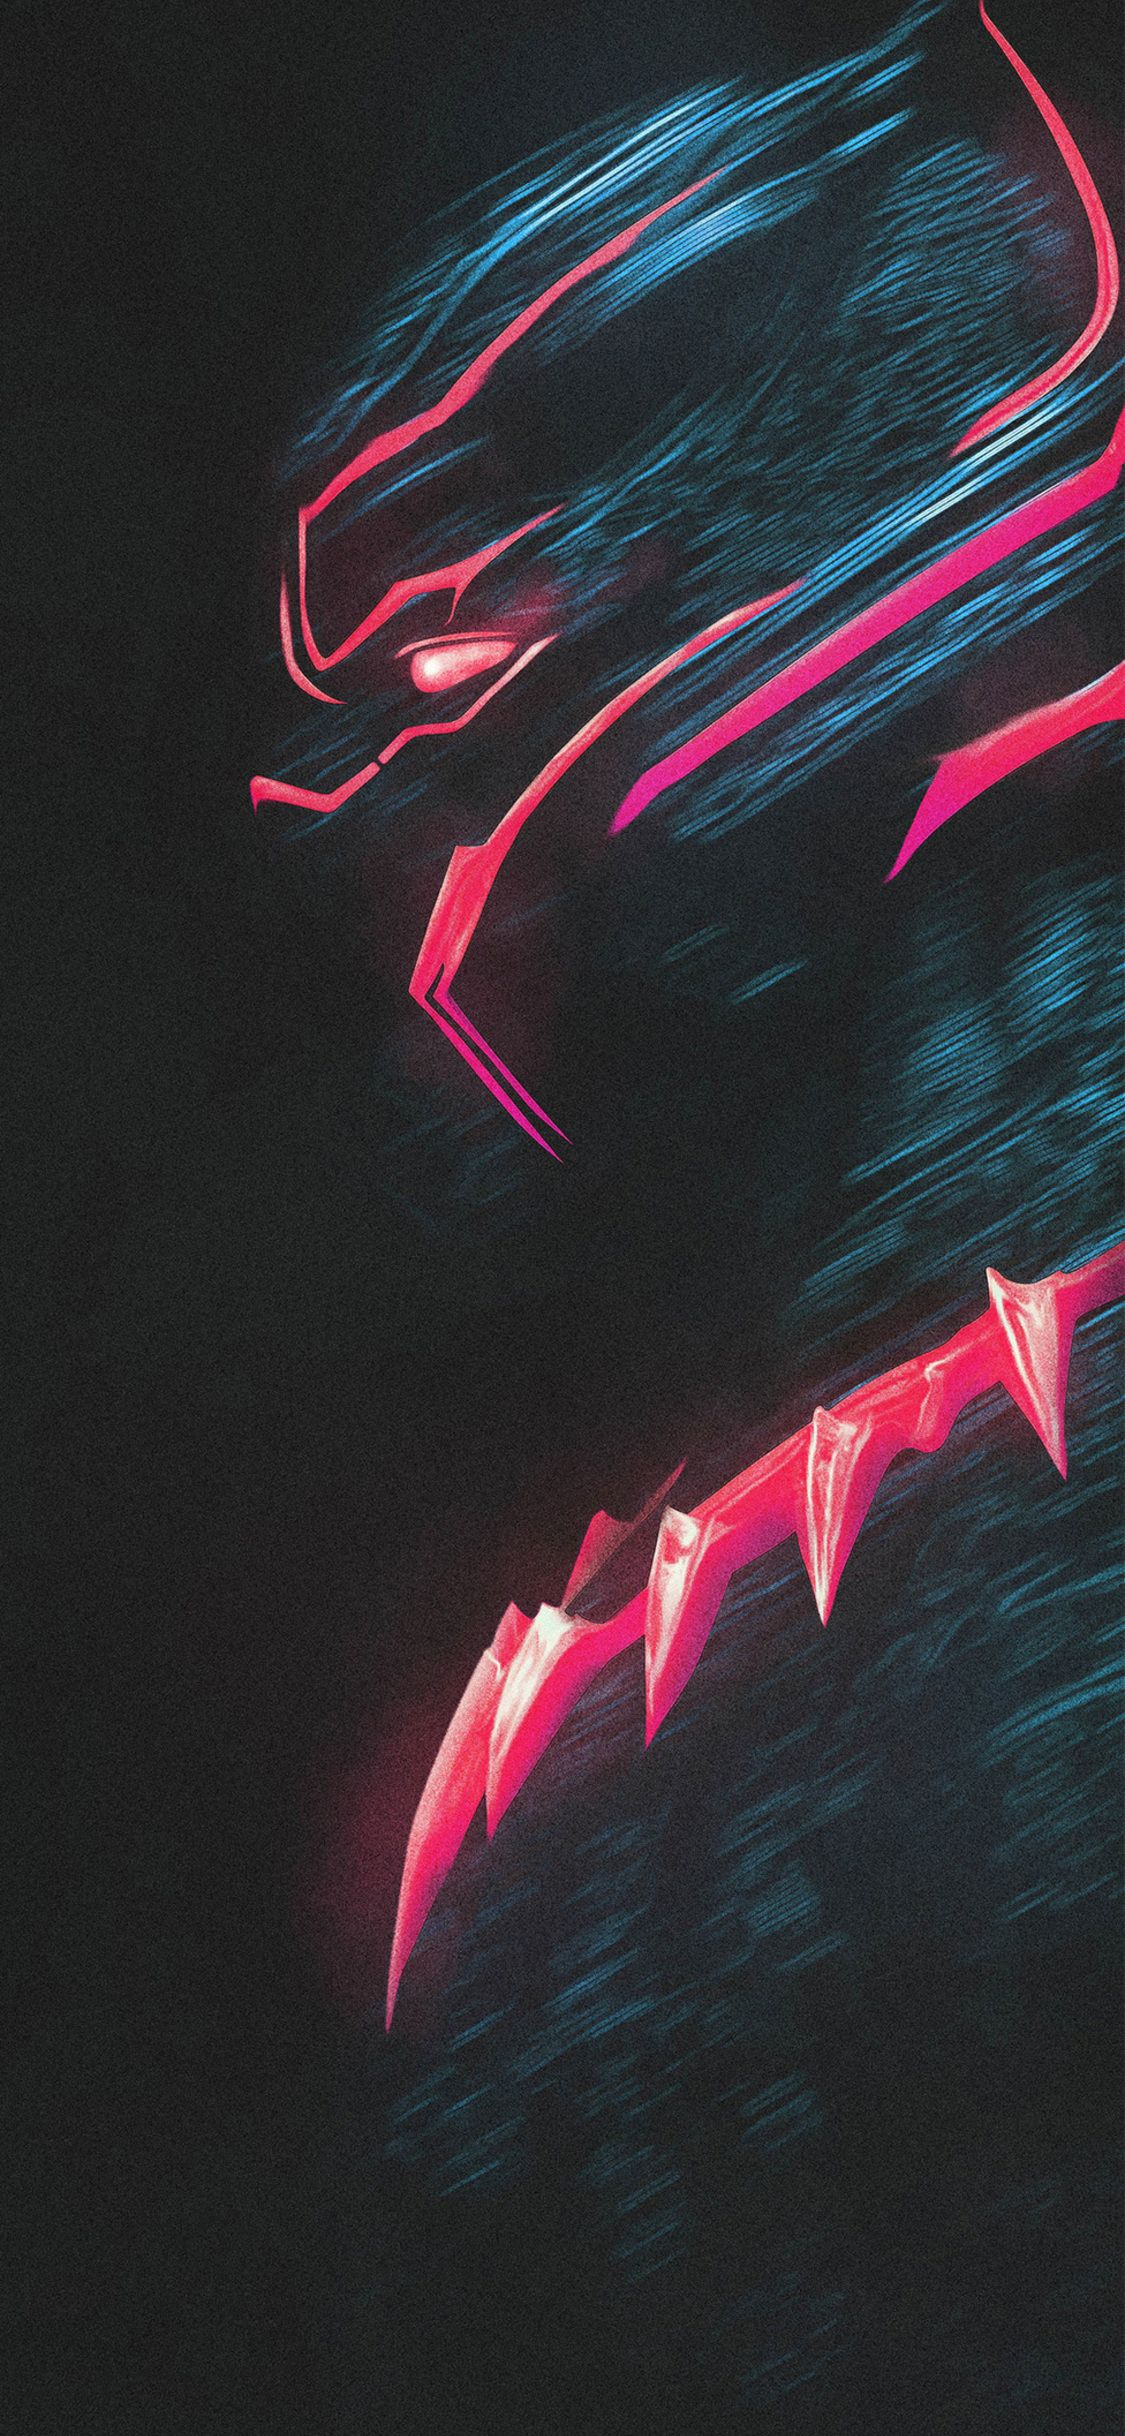 Black Panther Wallpaper 4k Iphone 3d Wallpapers Superhero Wallpaper Black Panther Black Panther Marvel